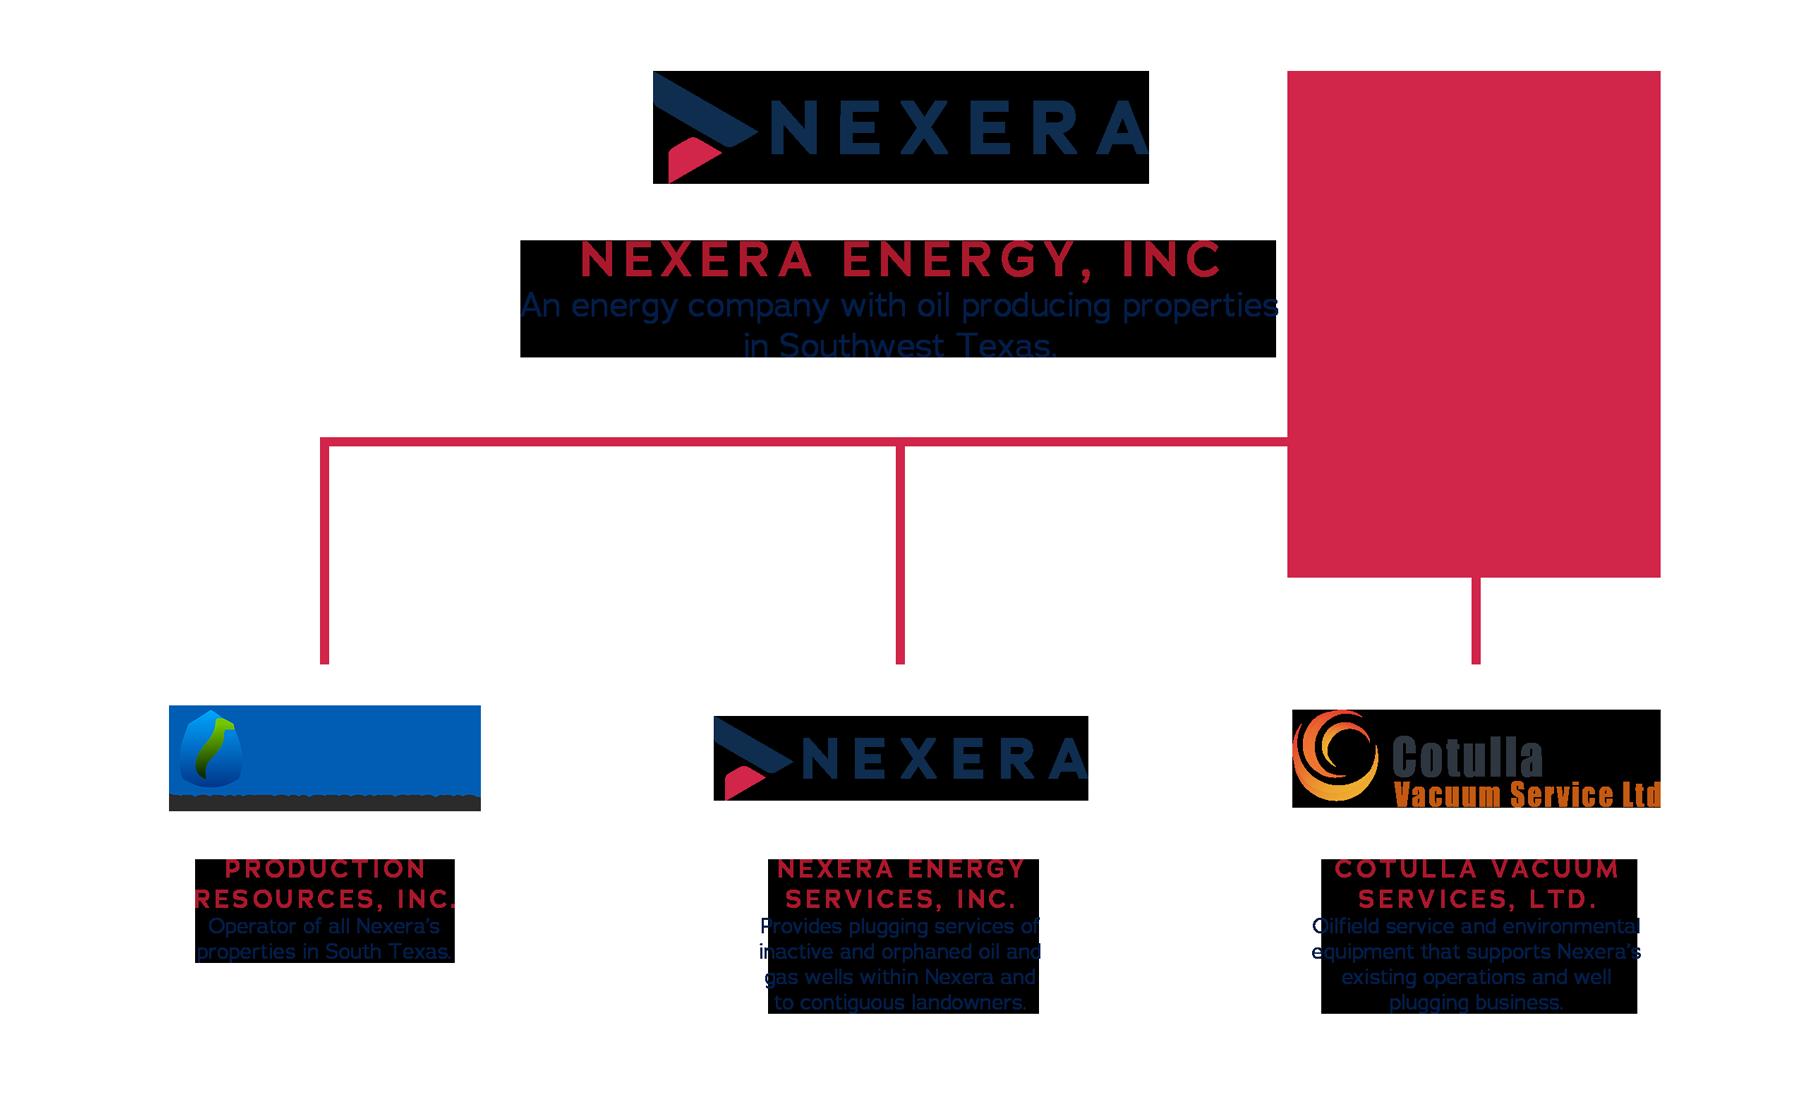 2021-07-09-nexera-tree-diagram-transparent-background-04